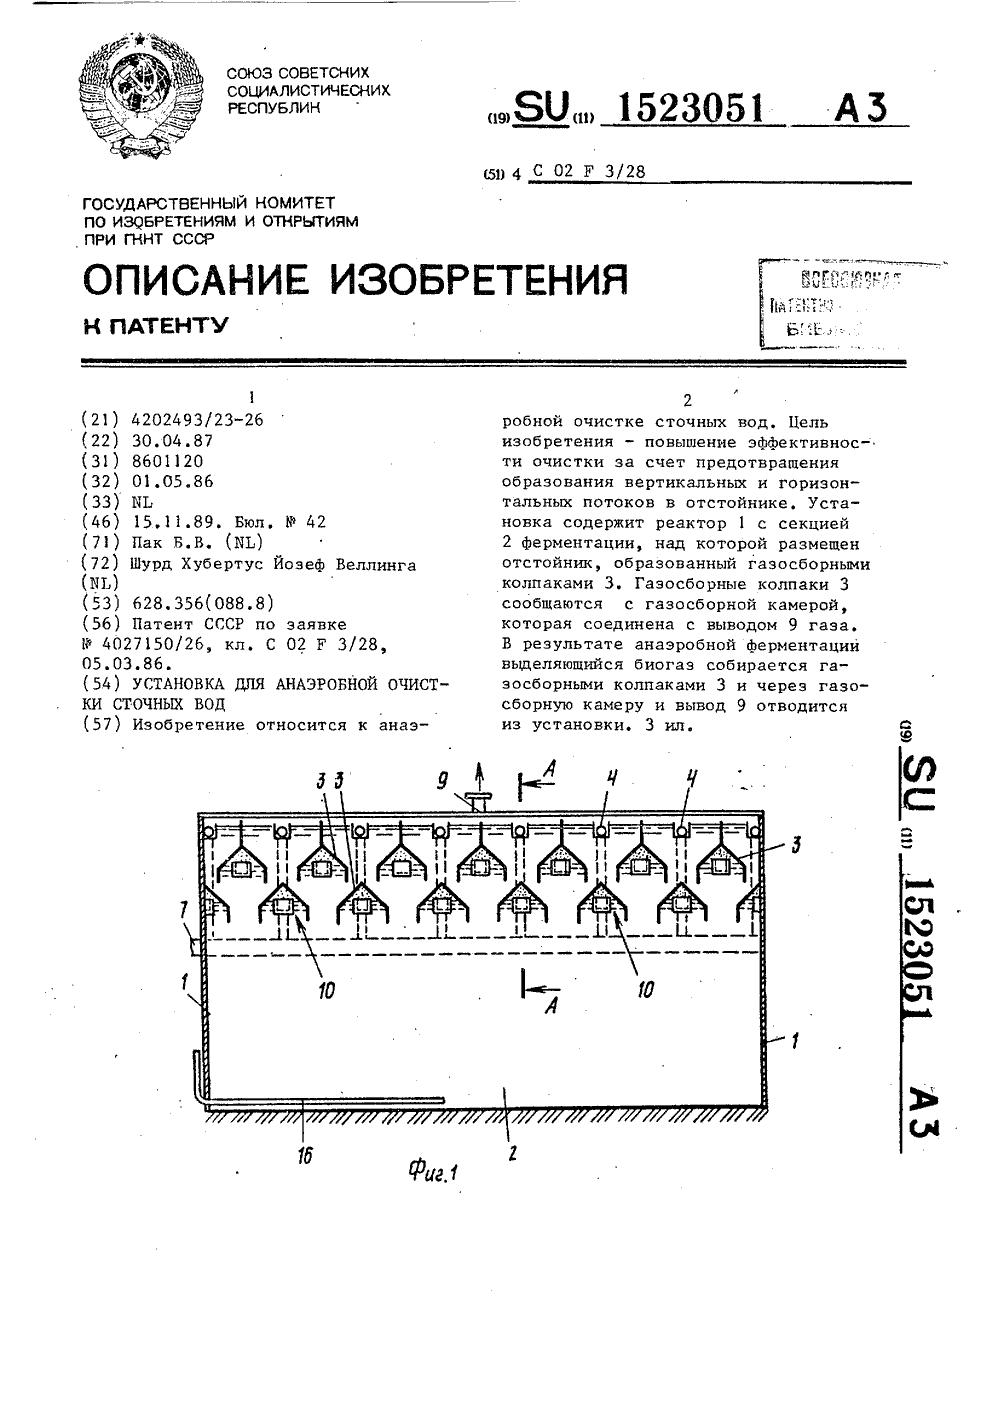 схема системы анаэробной очистки метантенк